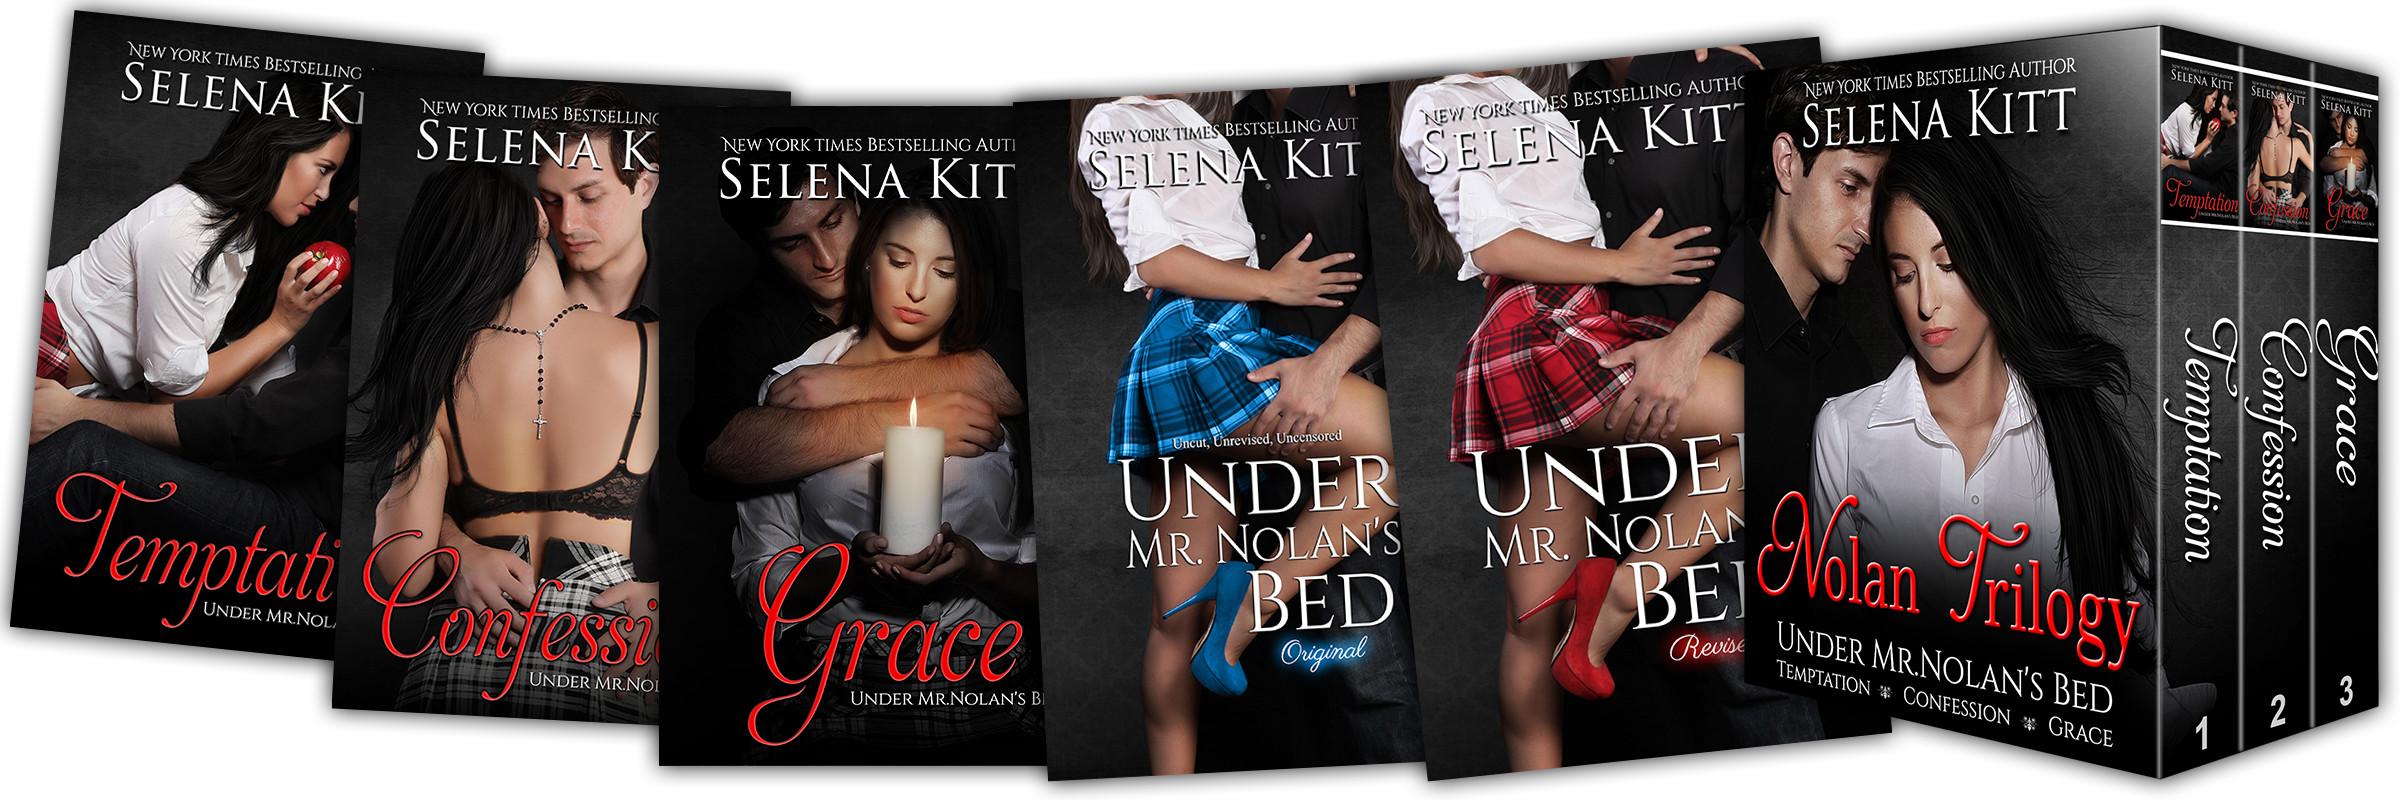 Under Mr. Nolan's Bed Trilogy by Selena Kitt